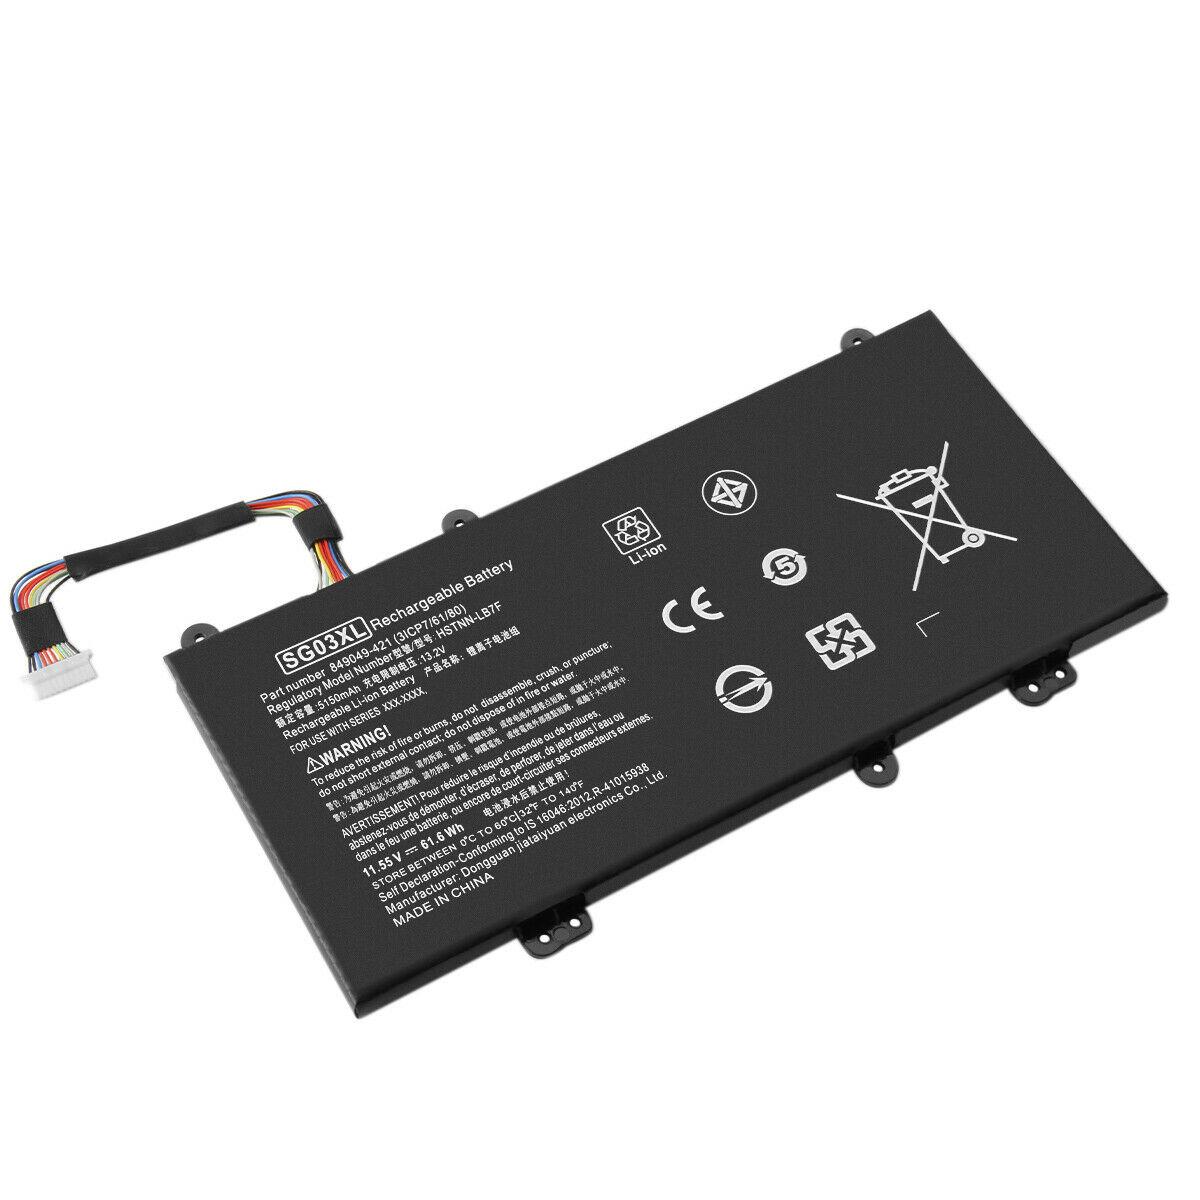 akku für 11.55V SG03XL SGO3XL HP Envy 17 Notebook M7 HSTNN-LB7E 849315-850 (kompatibel)